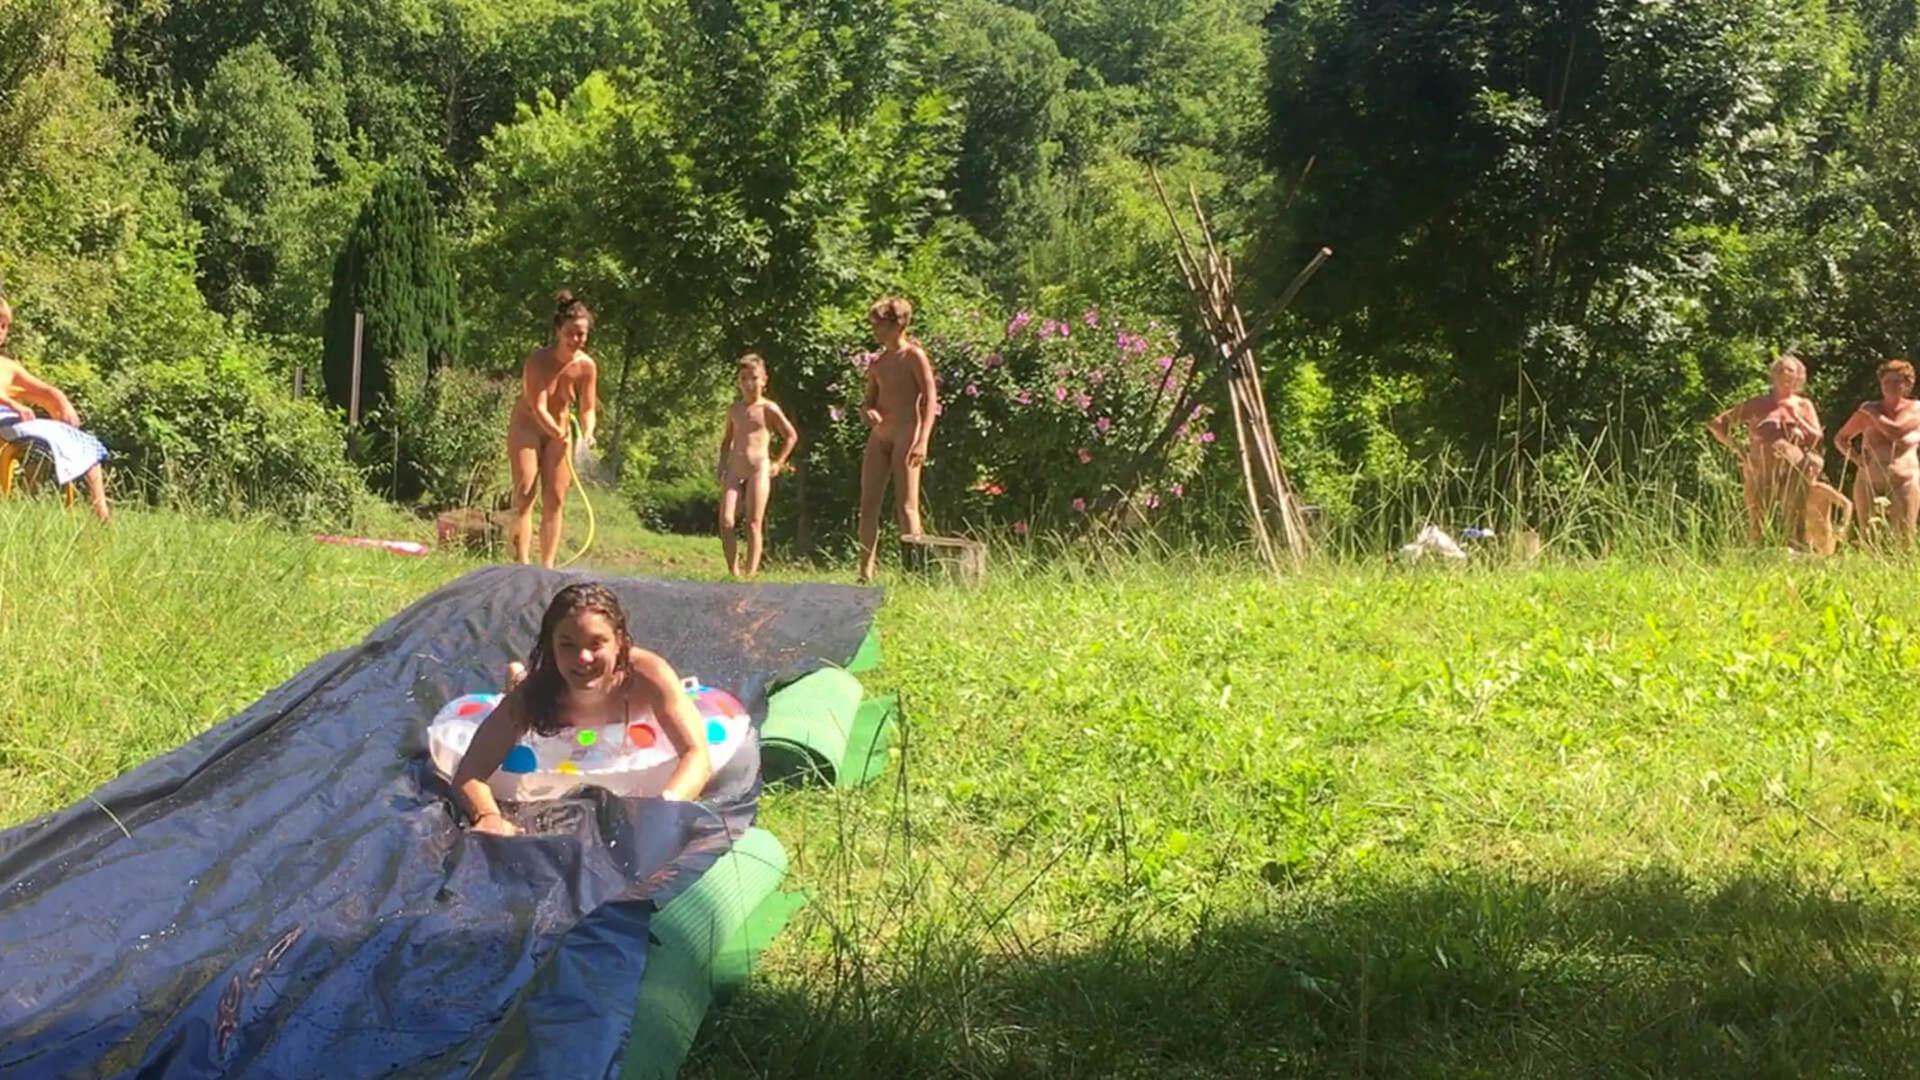 naturist activity